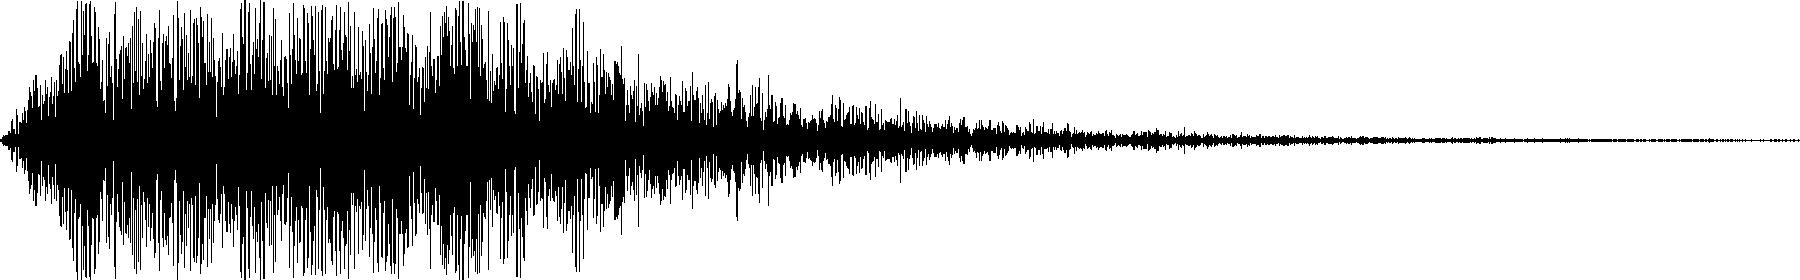 drive sound1